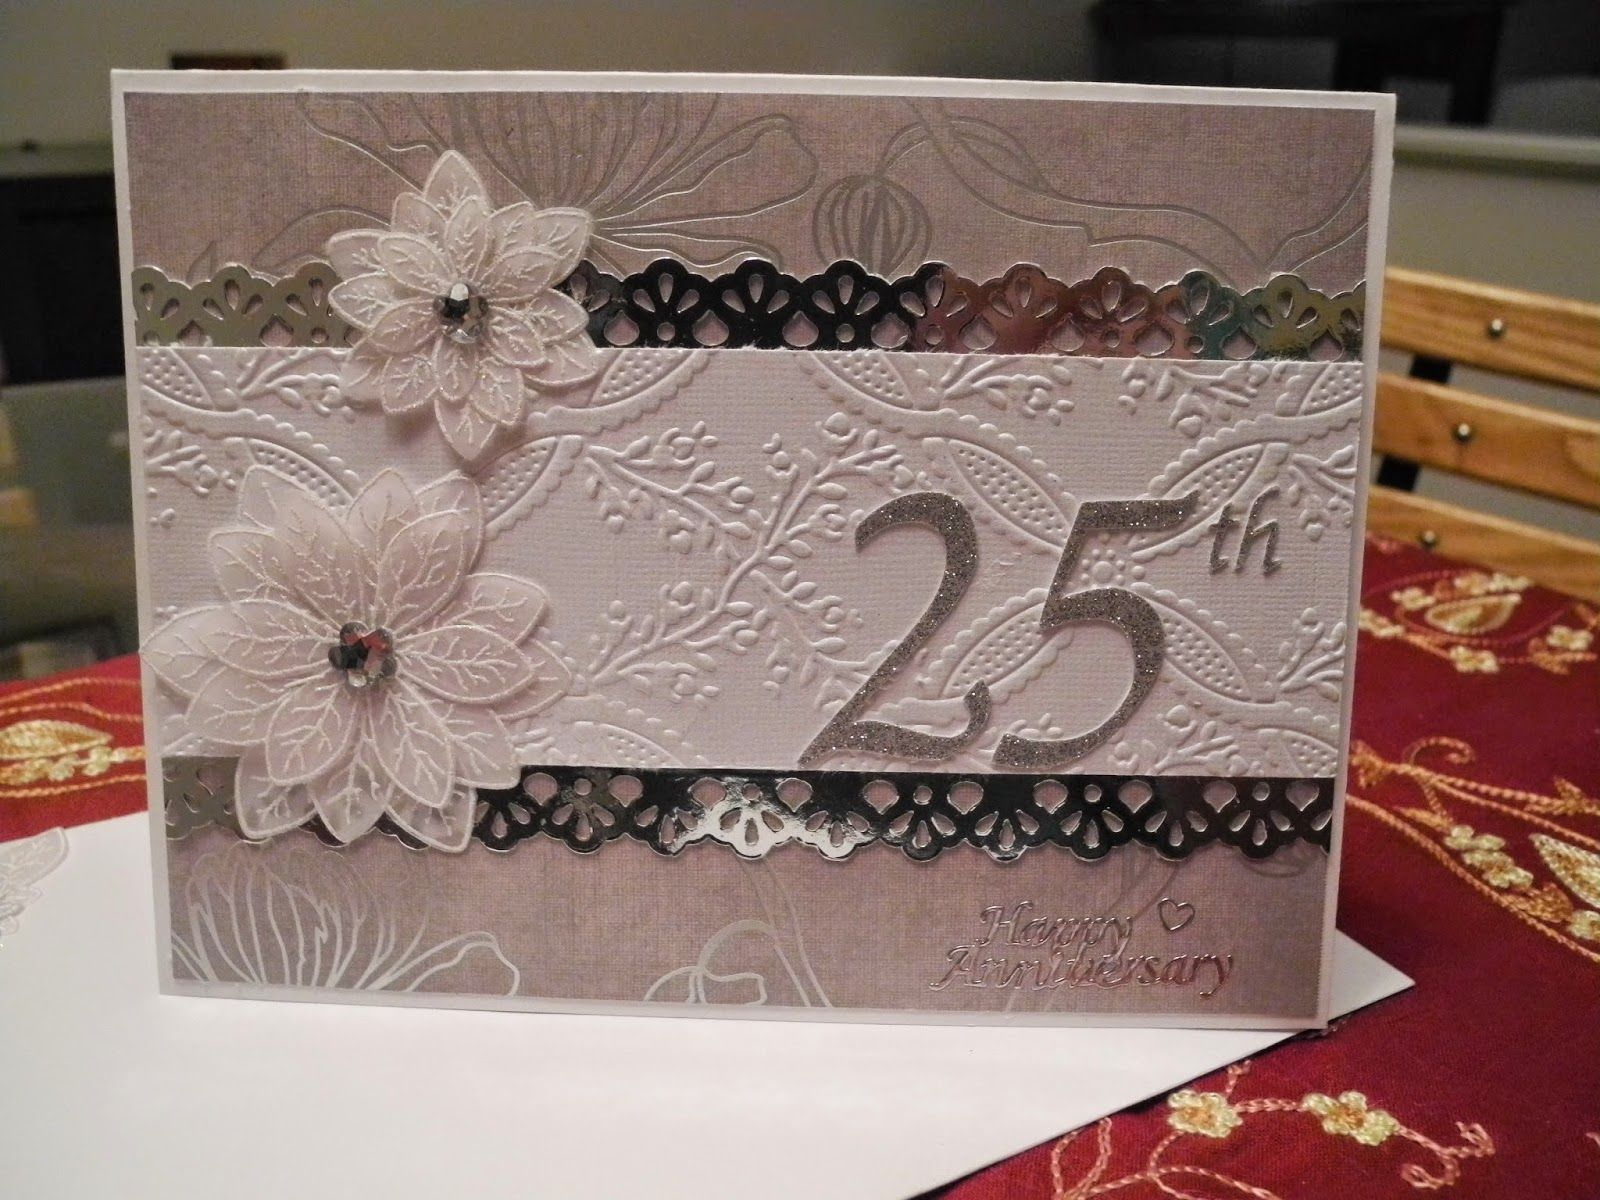 25th Anniversary Cards Donu0027t Run with Scissors